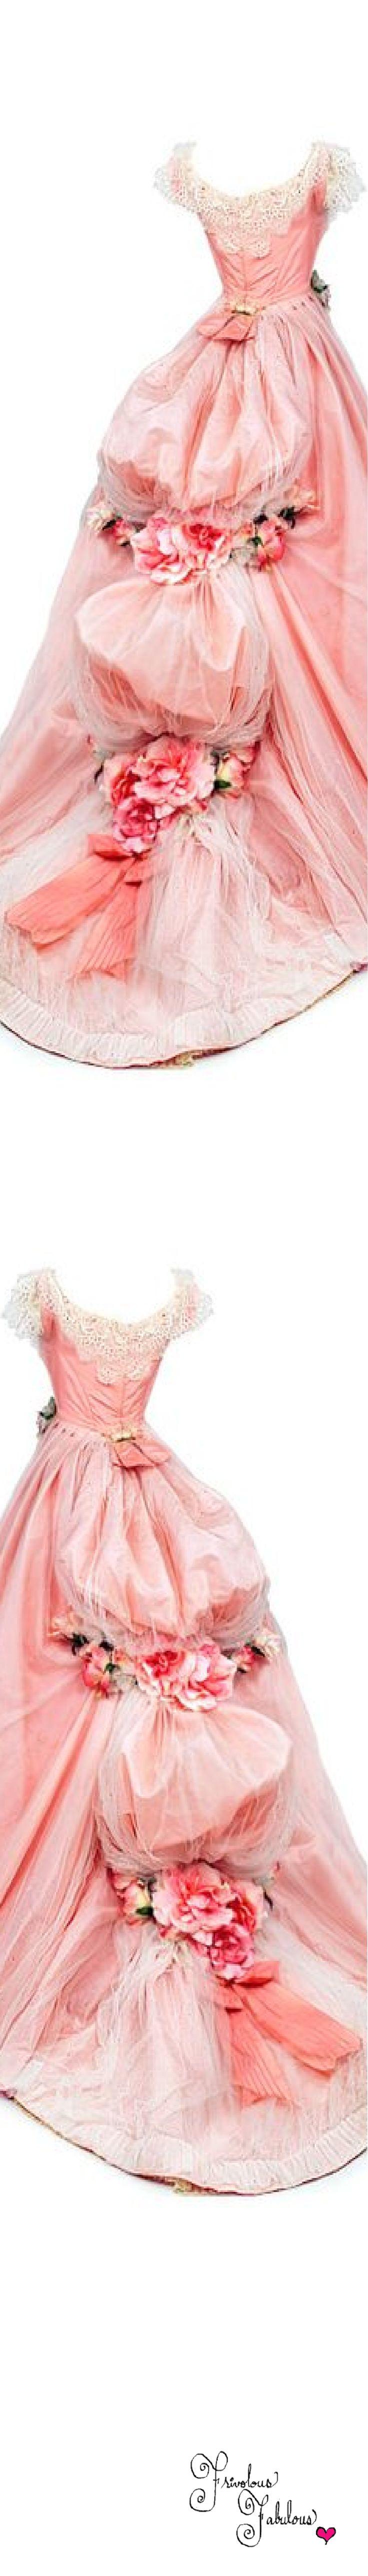 Frivolous Fabulous - Phantom of the Opera Costume Gown 2004